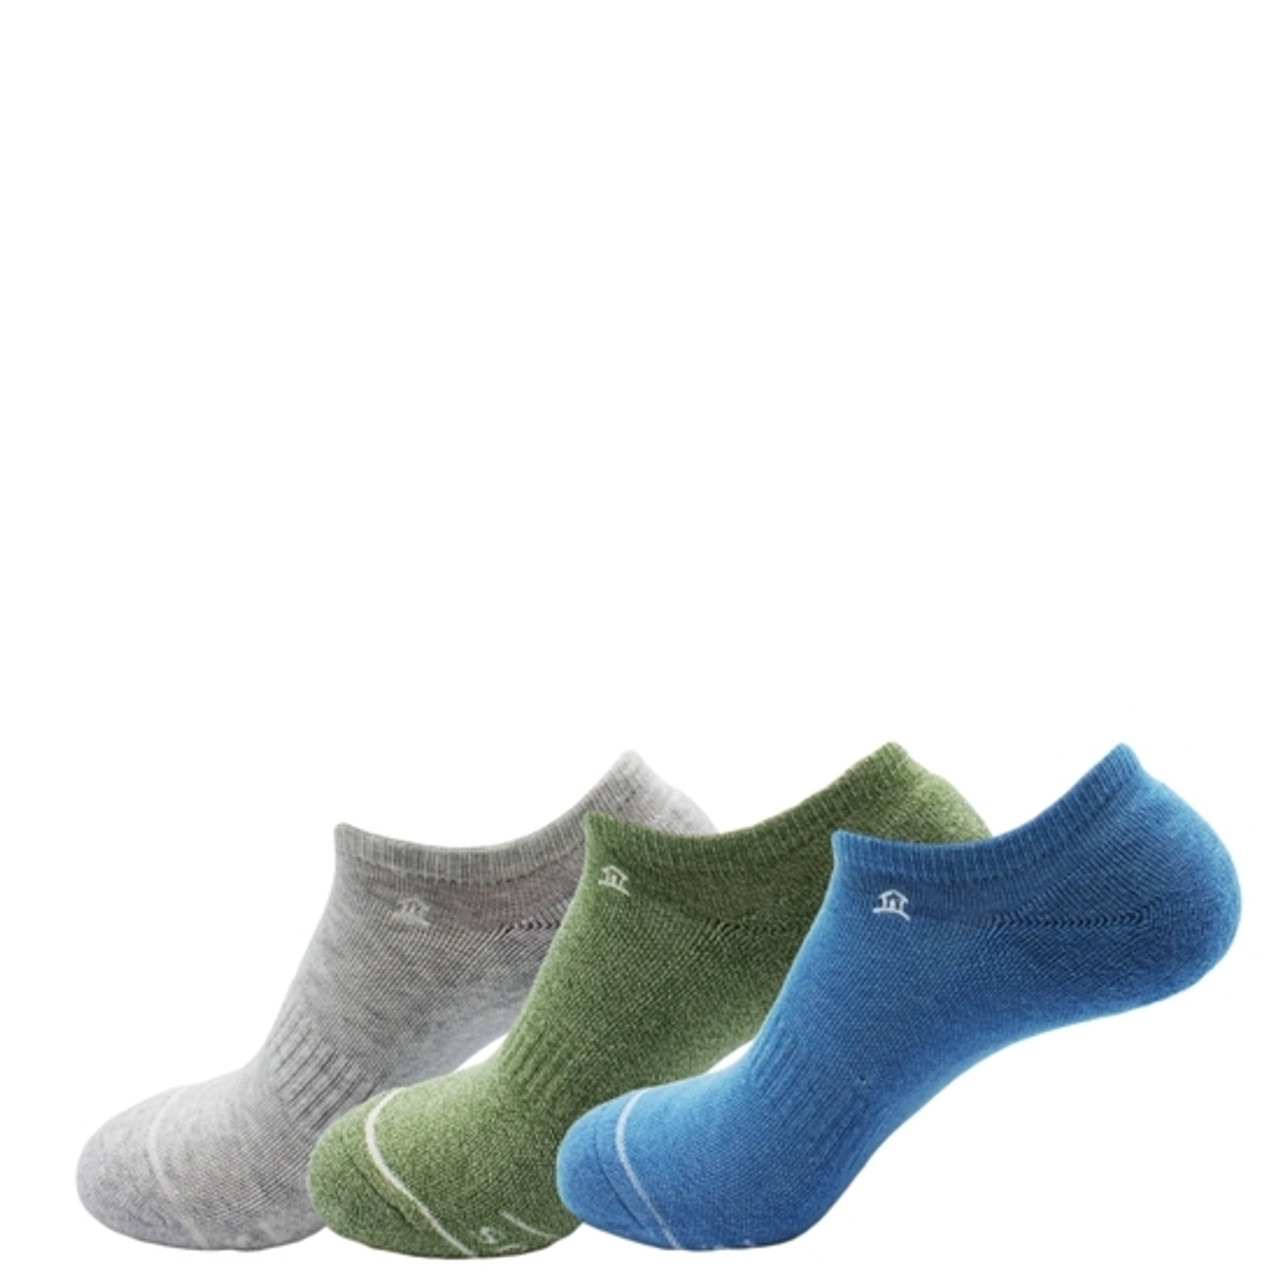 Organic Socks That Give Back - Build Homes, Set of 3